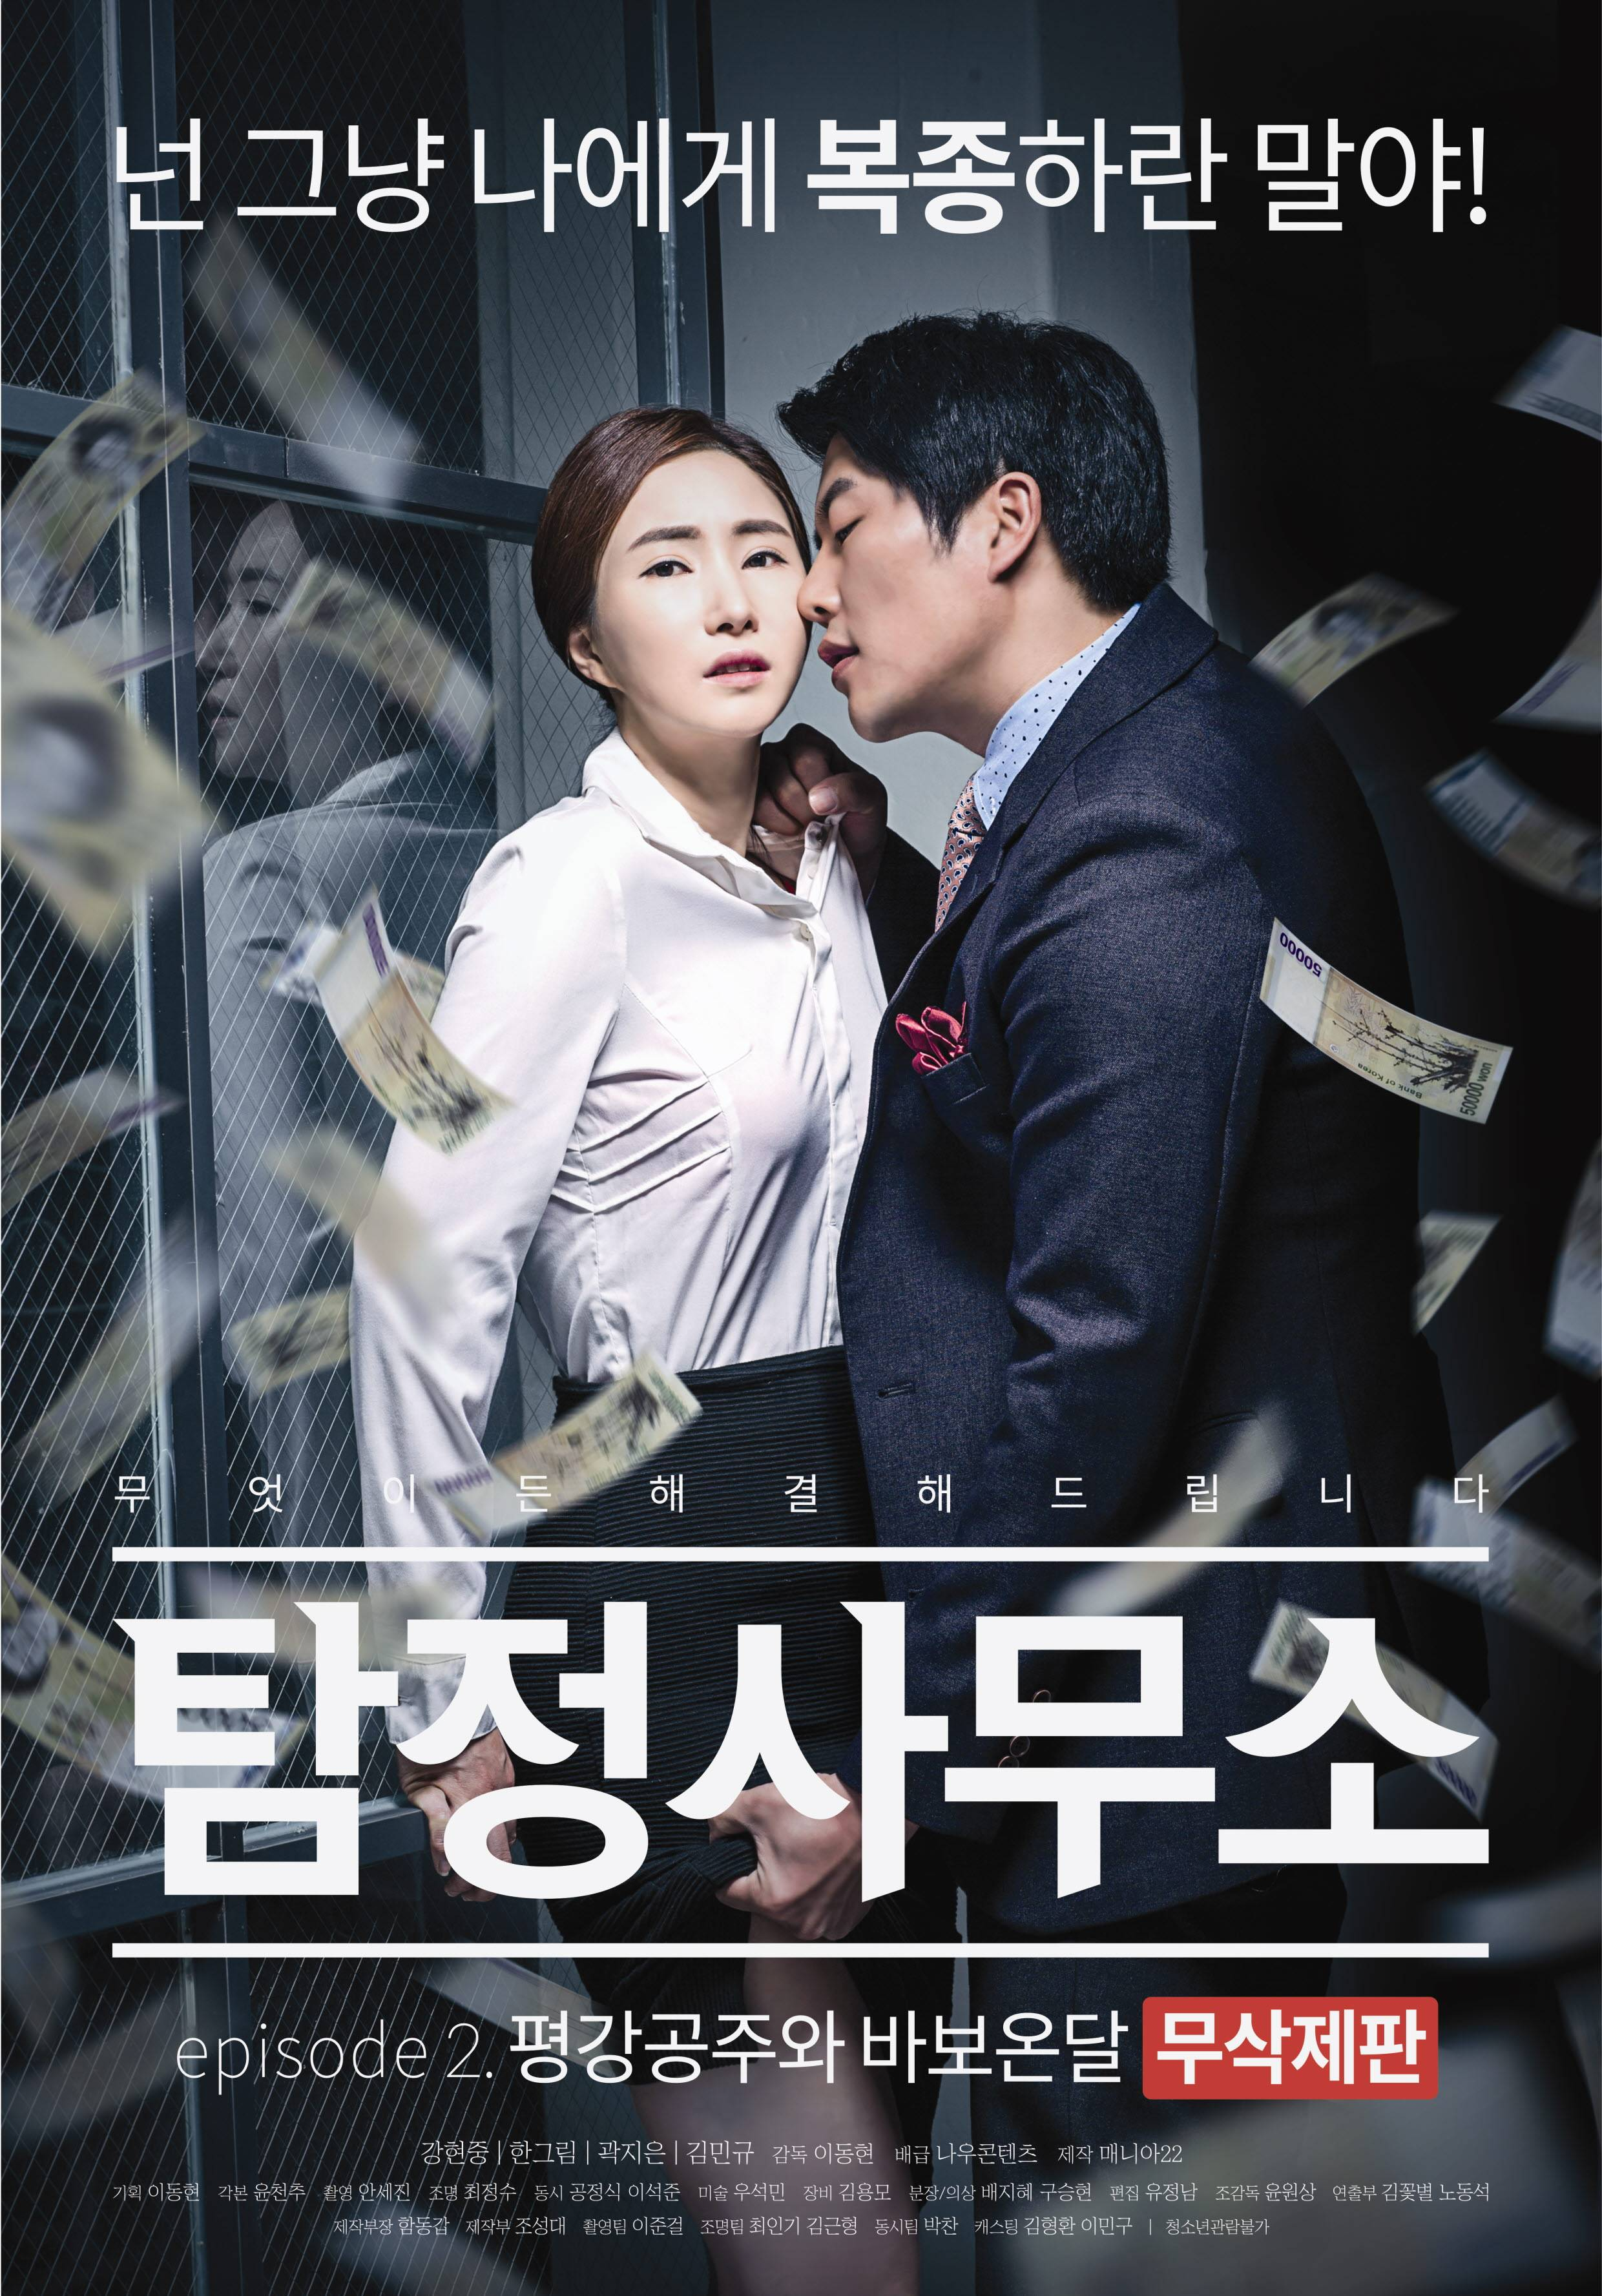 Detective 2016 full movie - 4 5